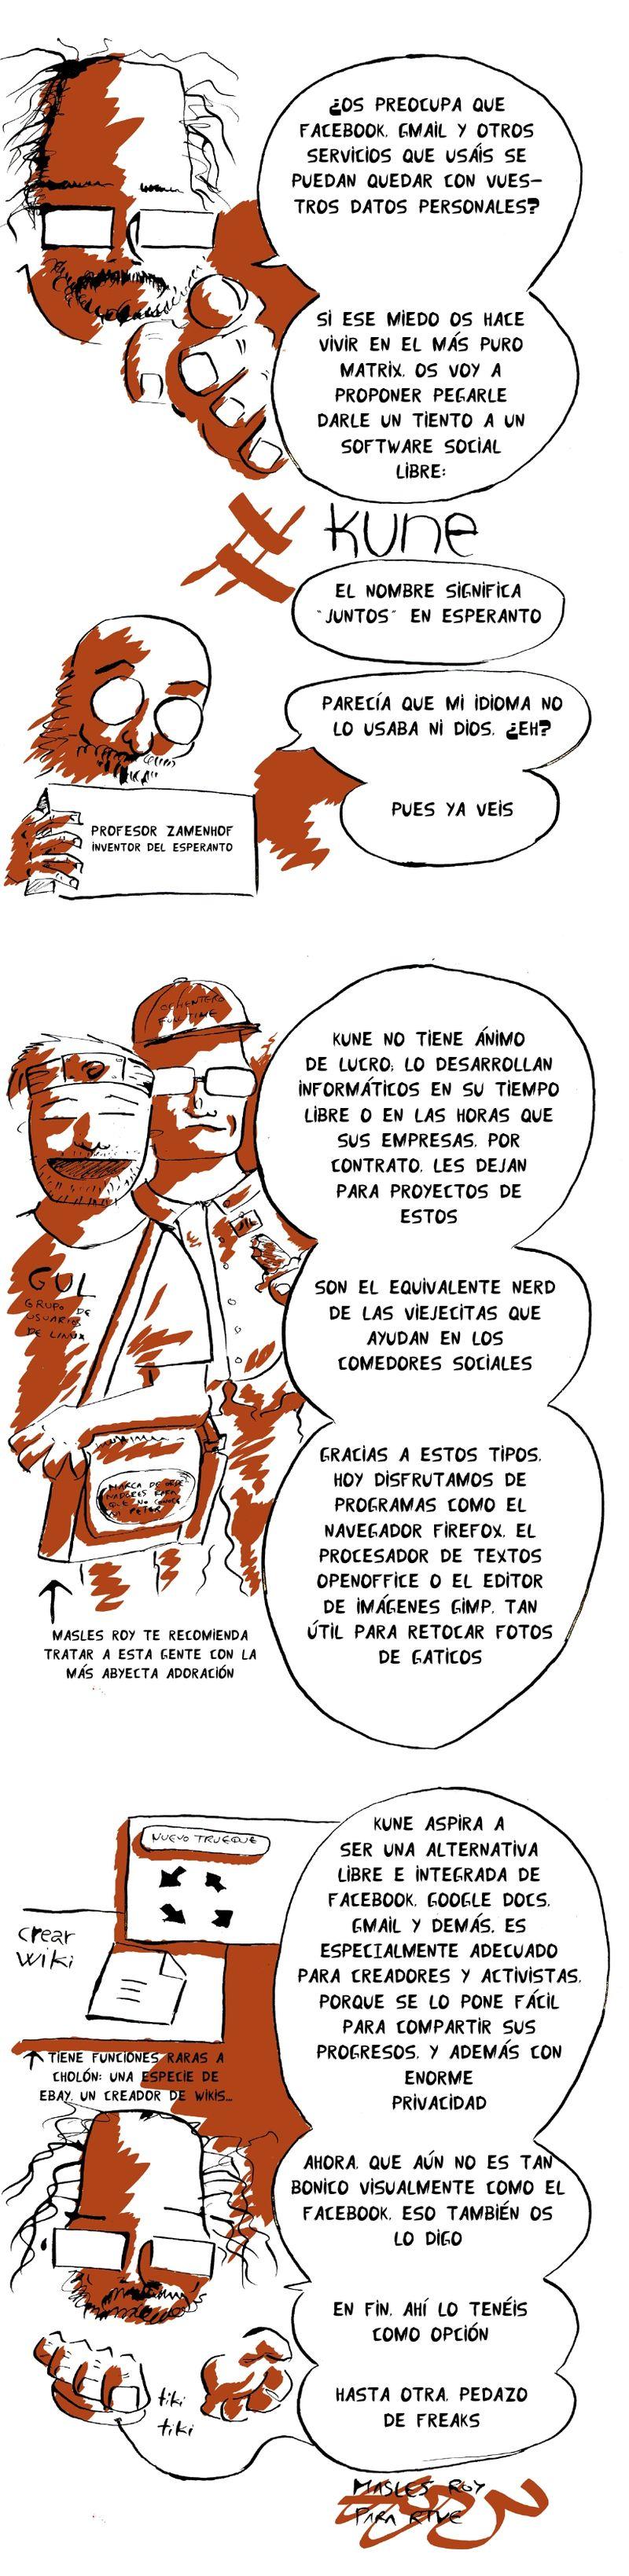 redes sociales software libre kune viñeta comic